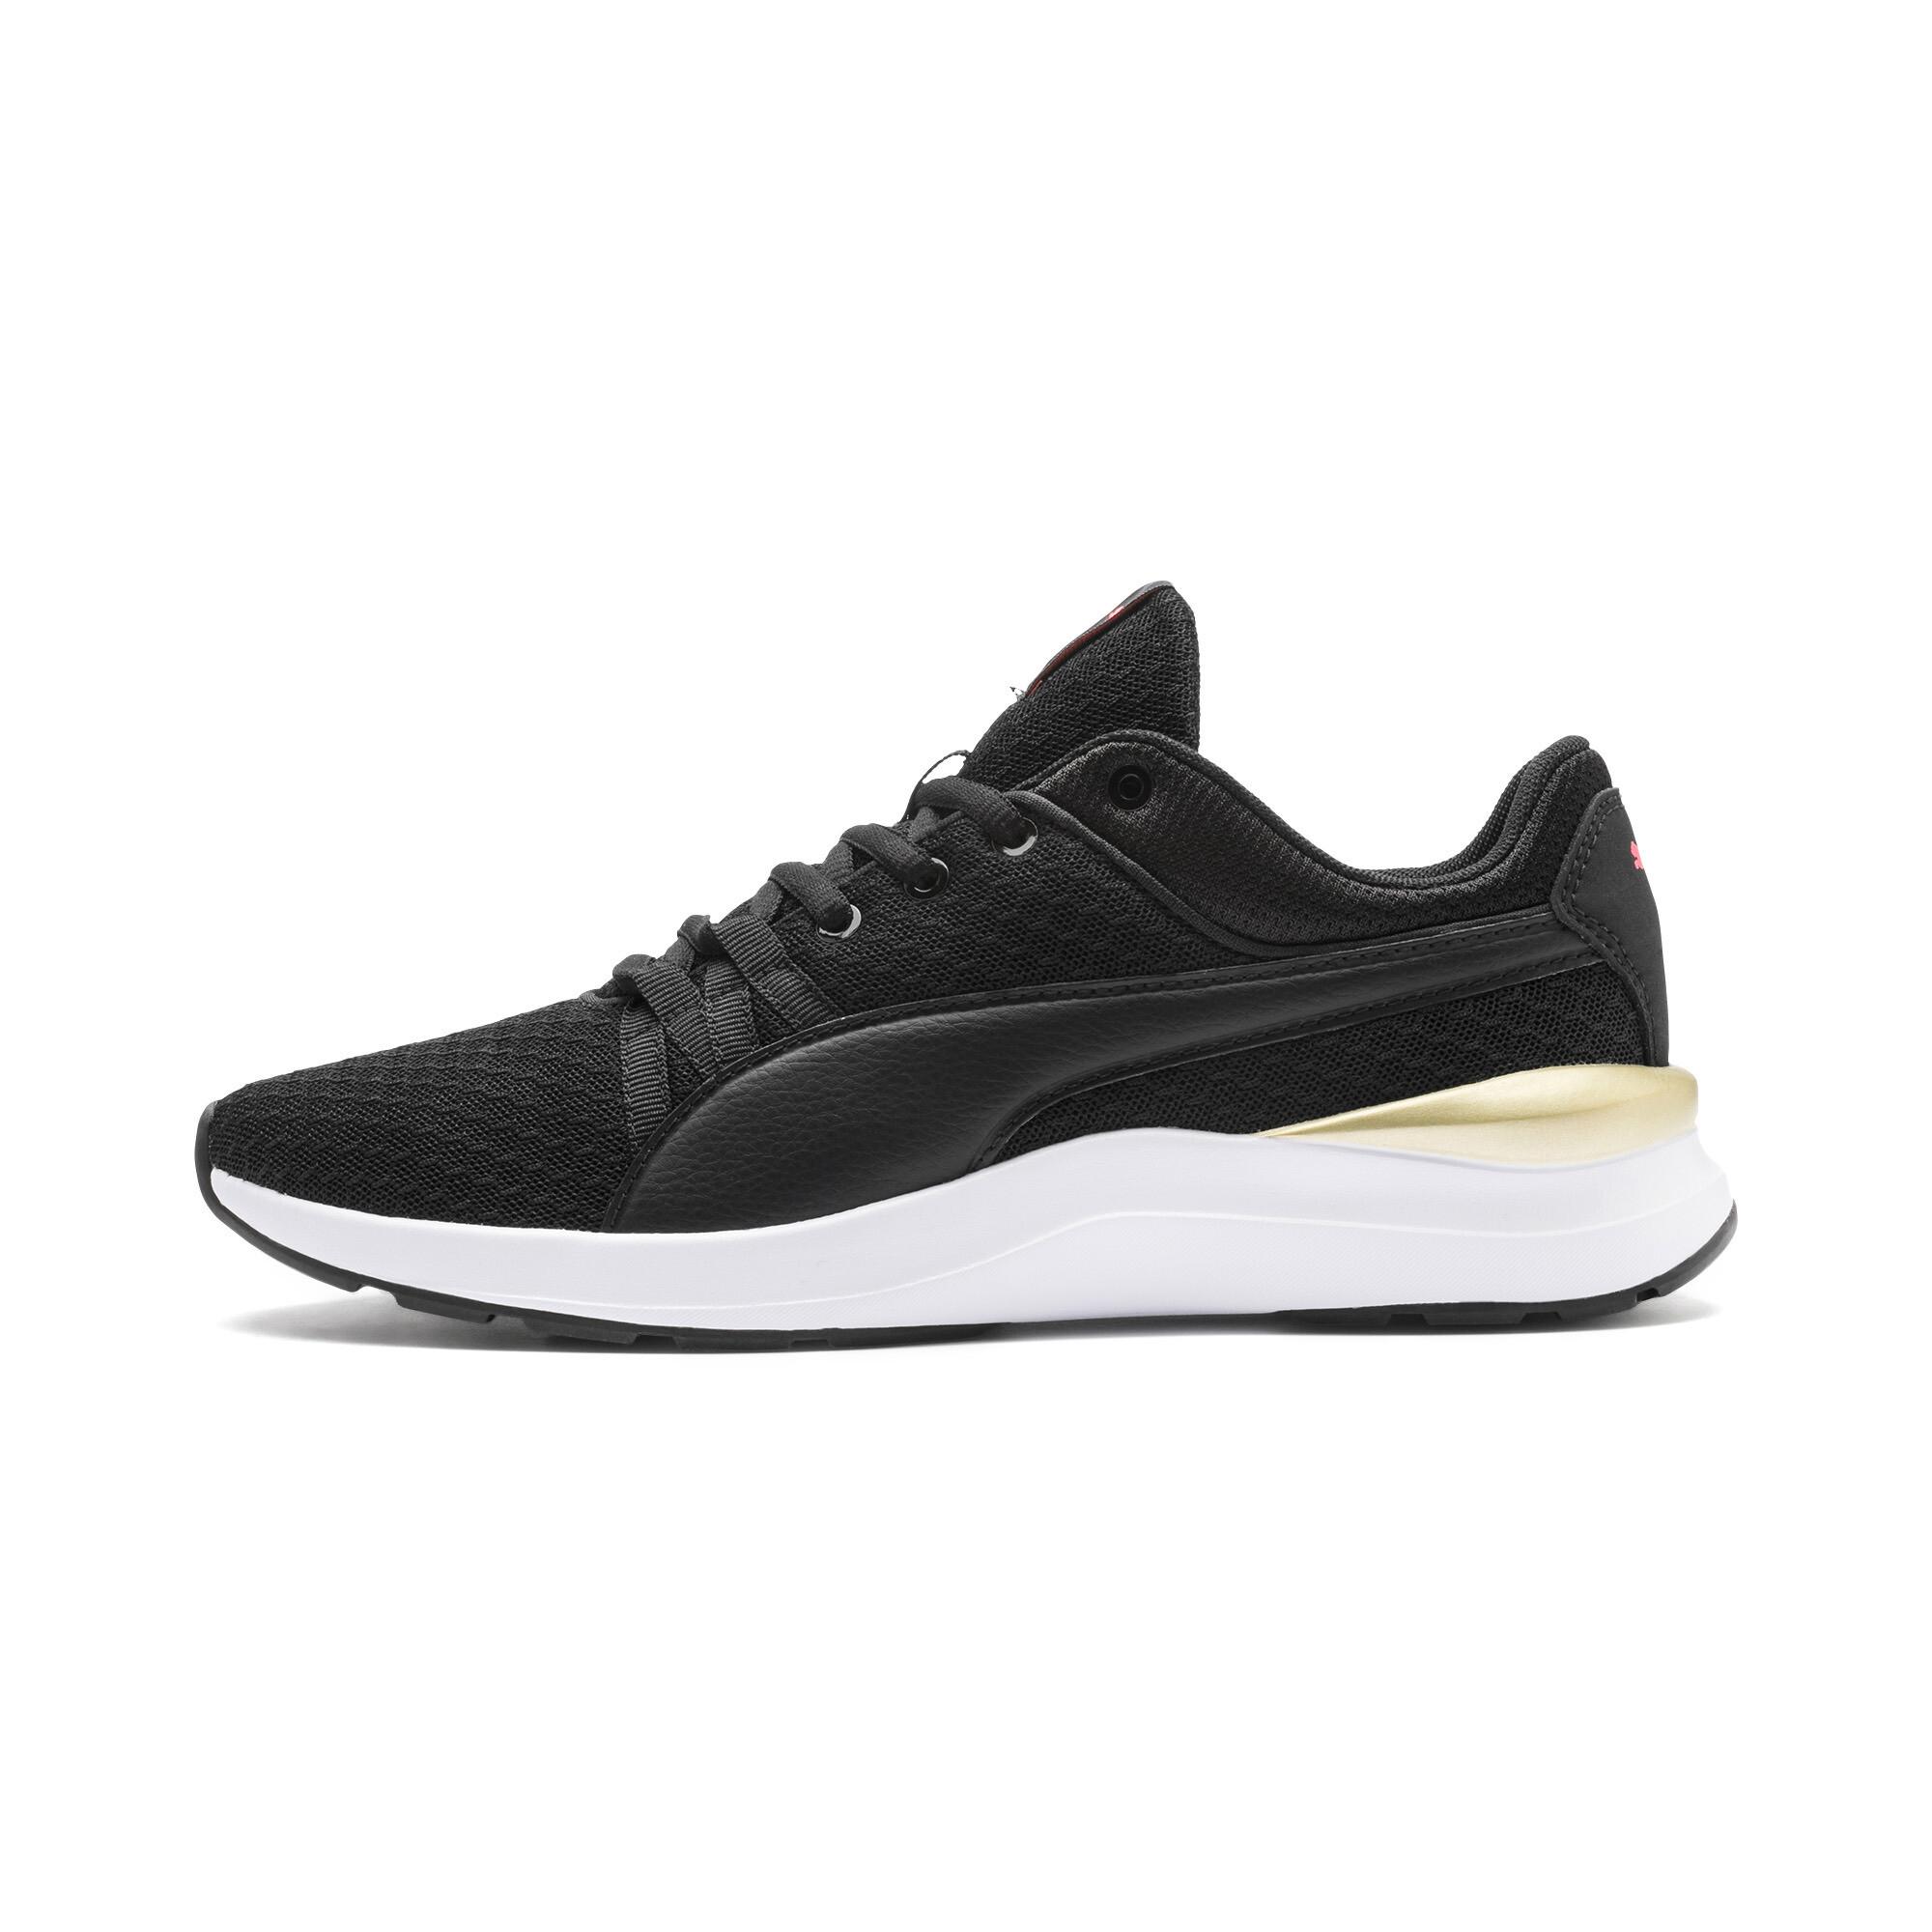 PUMA-Adela-Core-Women-s-Sneakers-Women-Shoe-Basics thumbnail 4